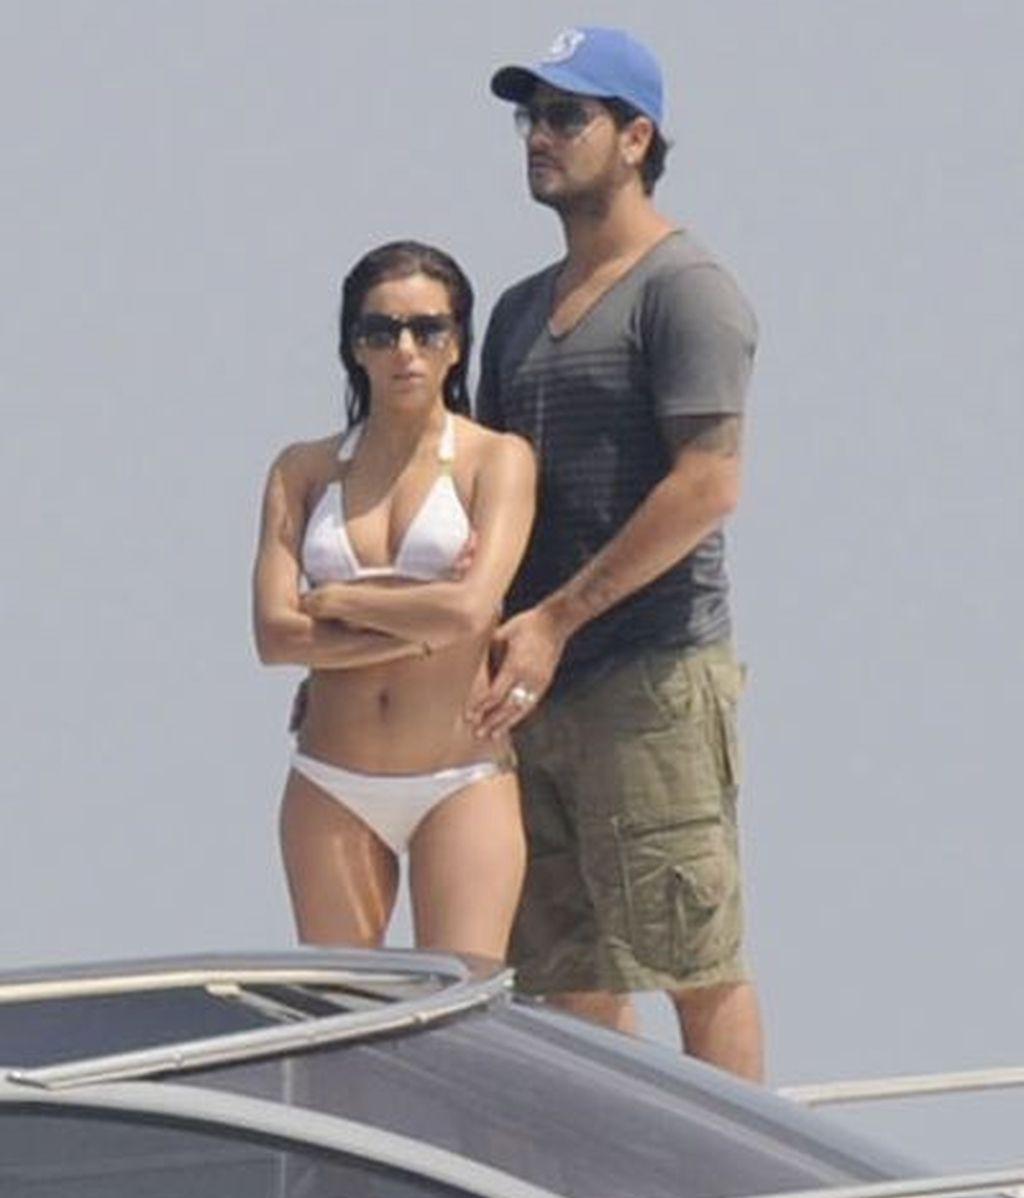 Eva Longoria y su novio, Eduardo Cruz, en yate por las aguas de Marbella